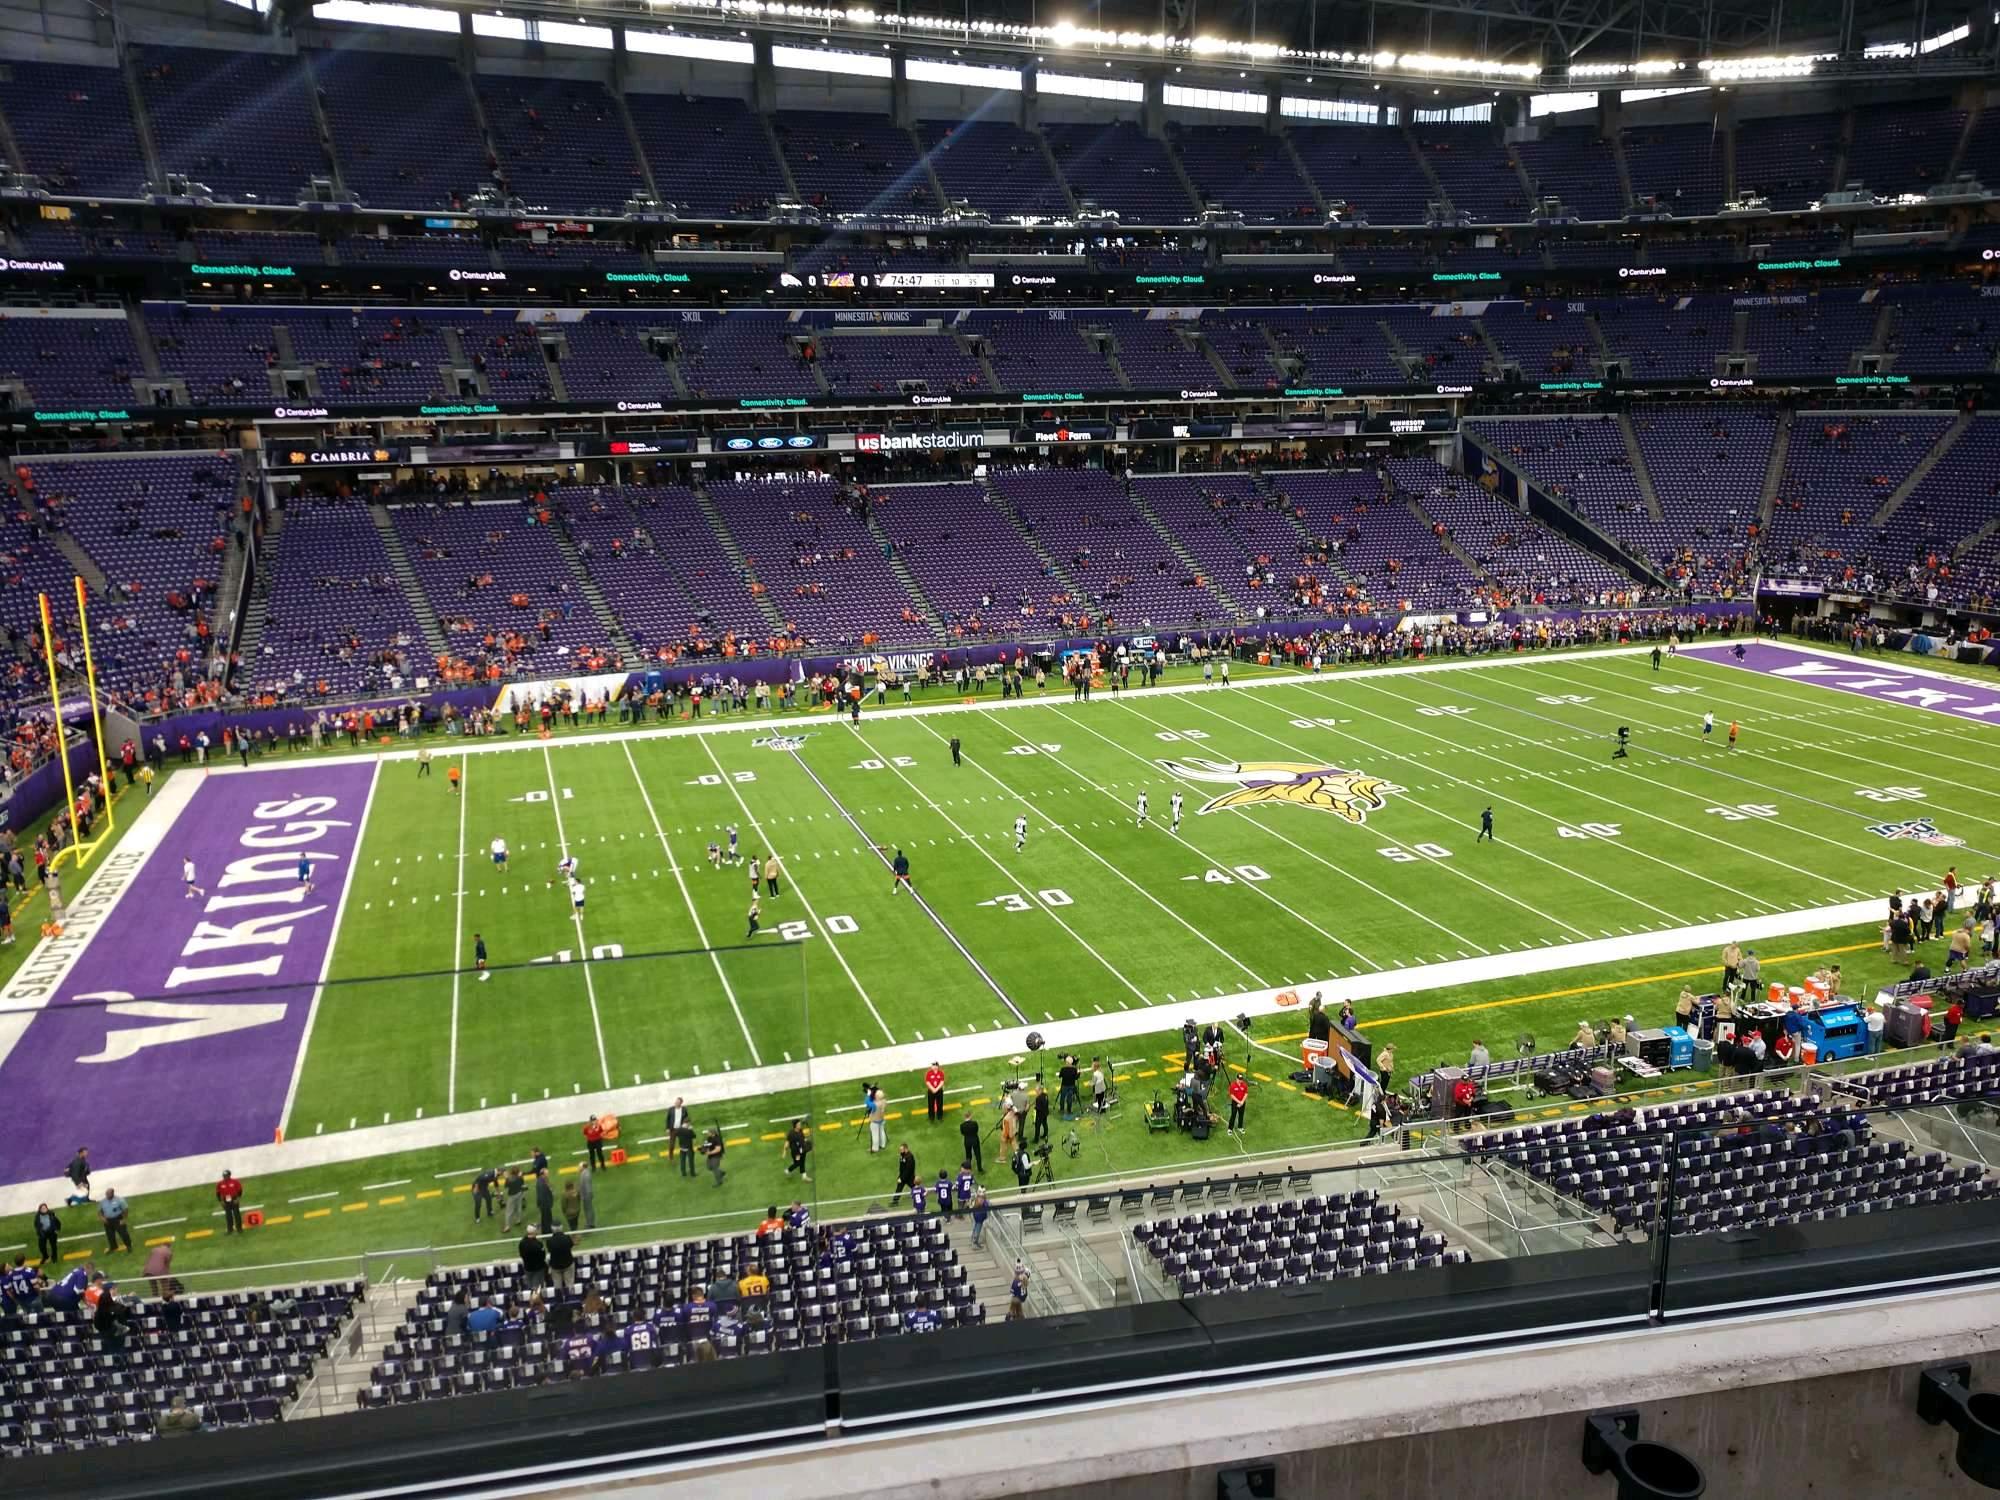 U.S. Bank Stadium Section 237 Row 2 Seat 12